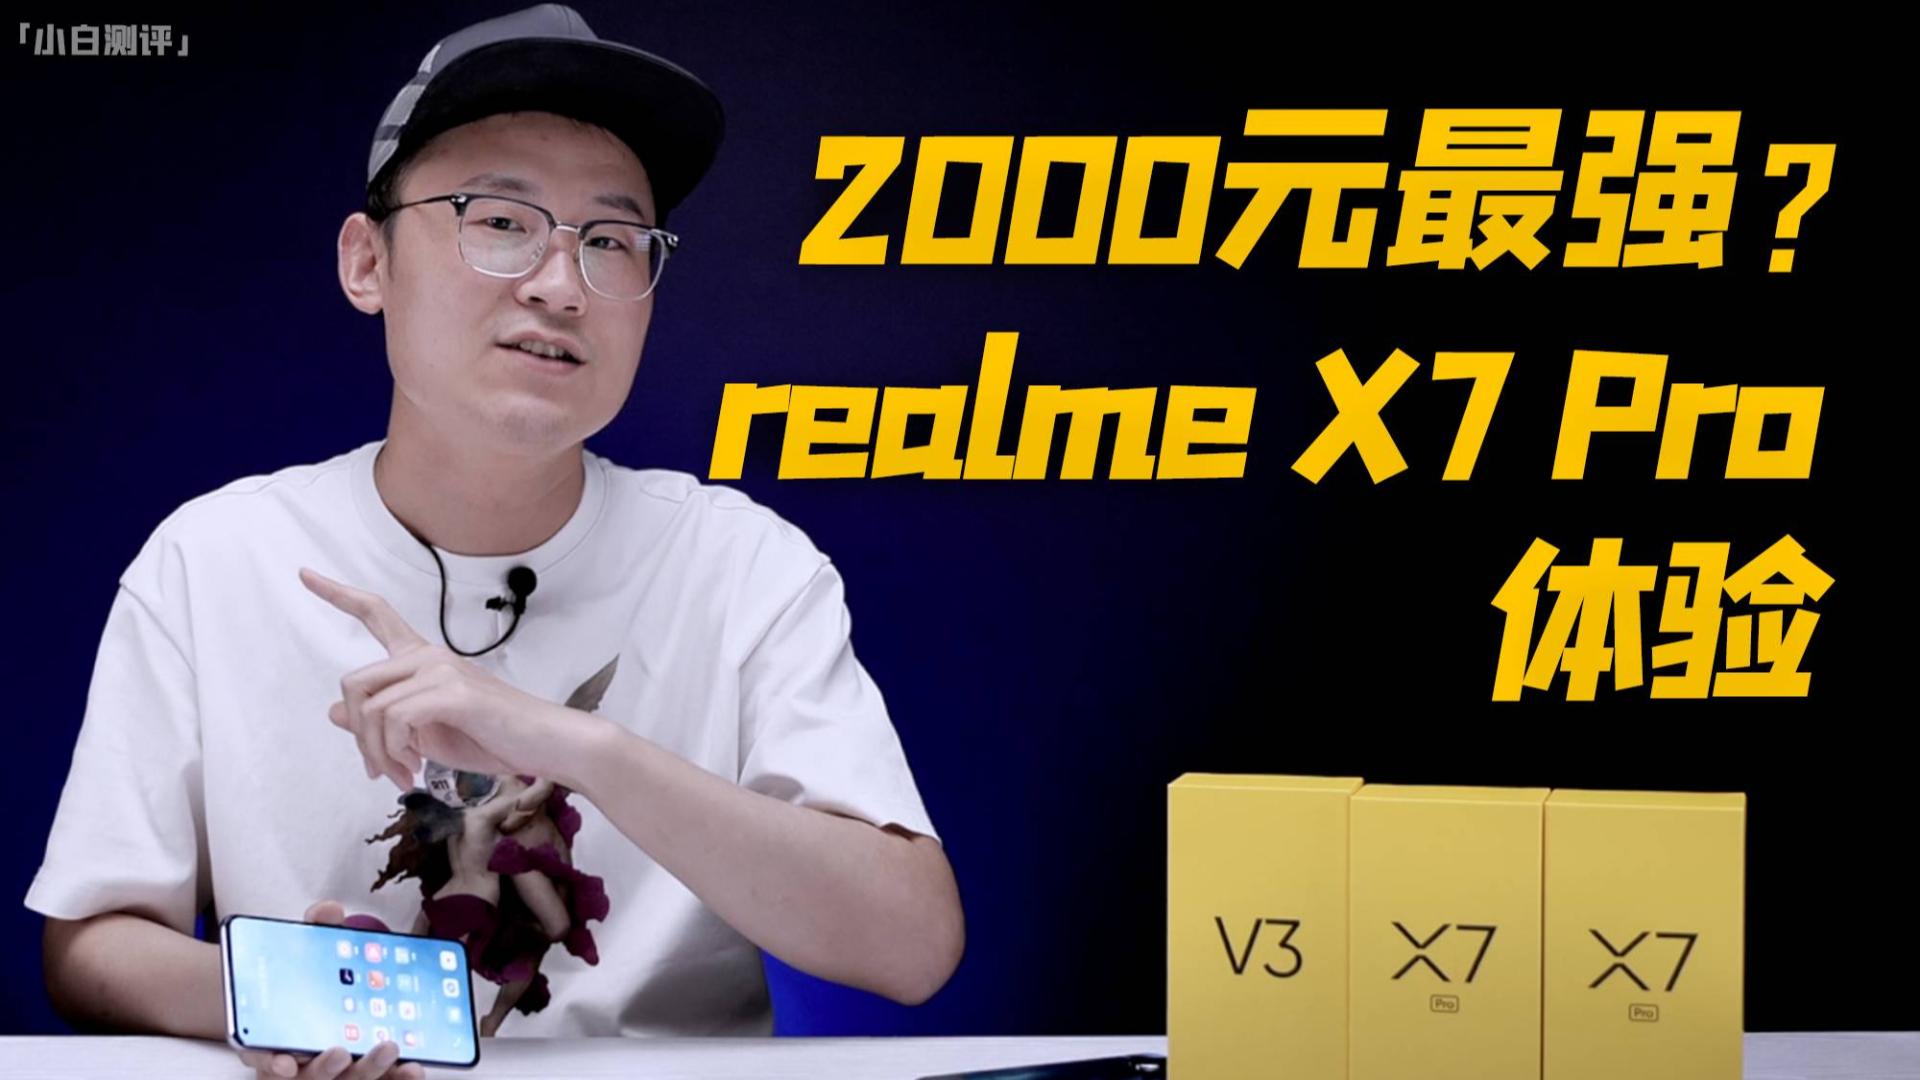 「小白测评」realme X7Pro体验 65W+120Hz屏 2000元档最强性价比?